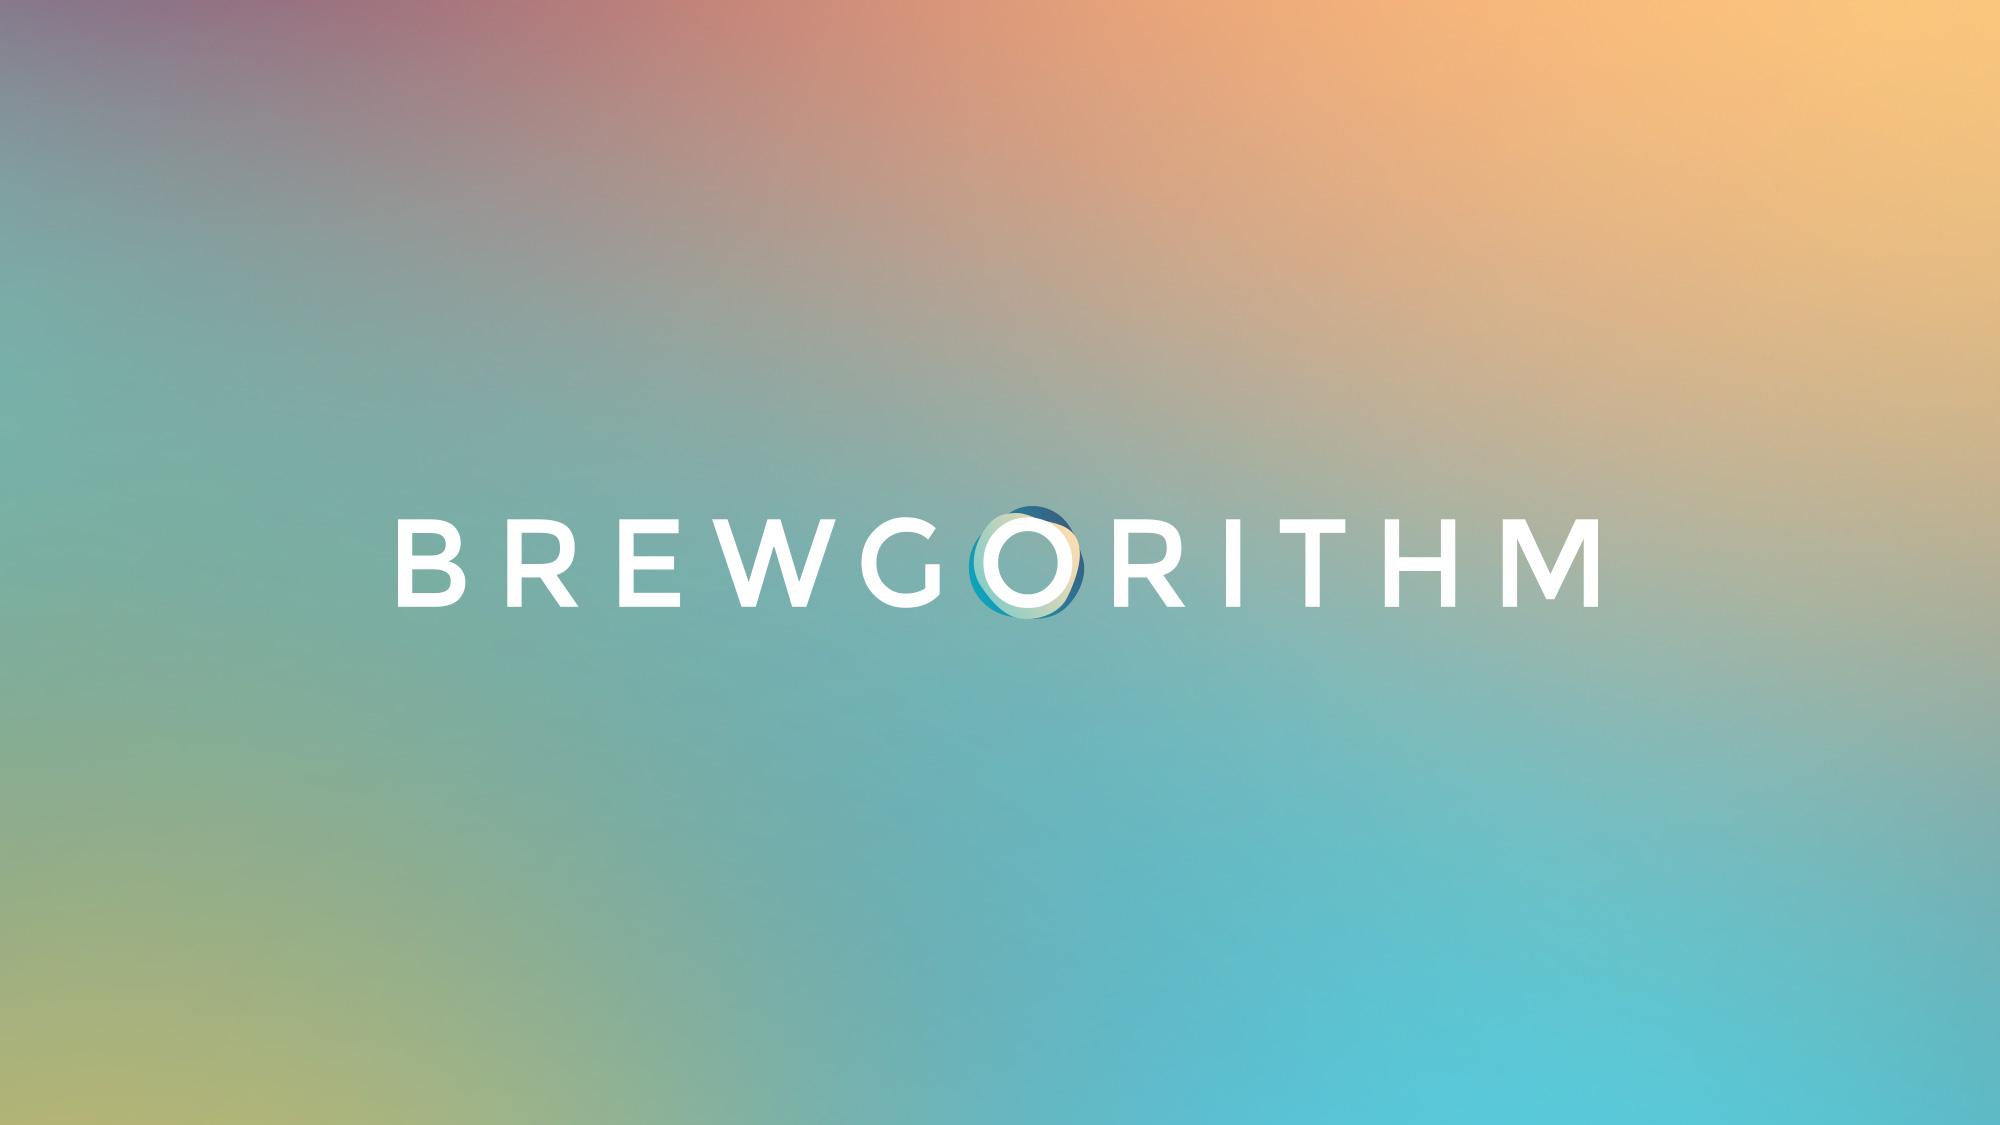 meng-he-brewgorithm-logo